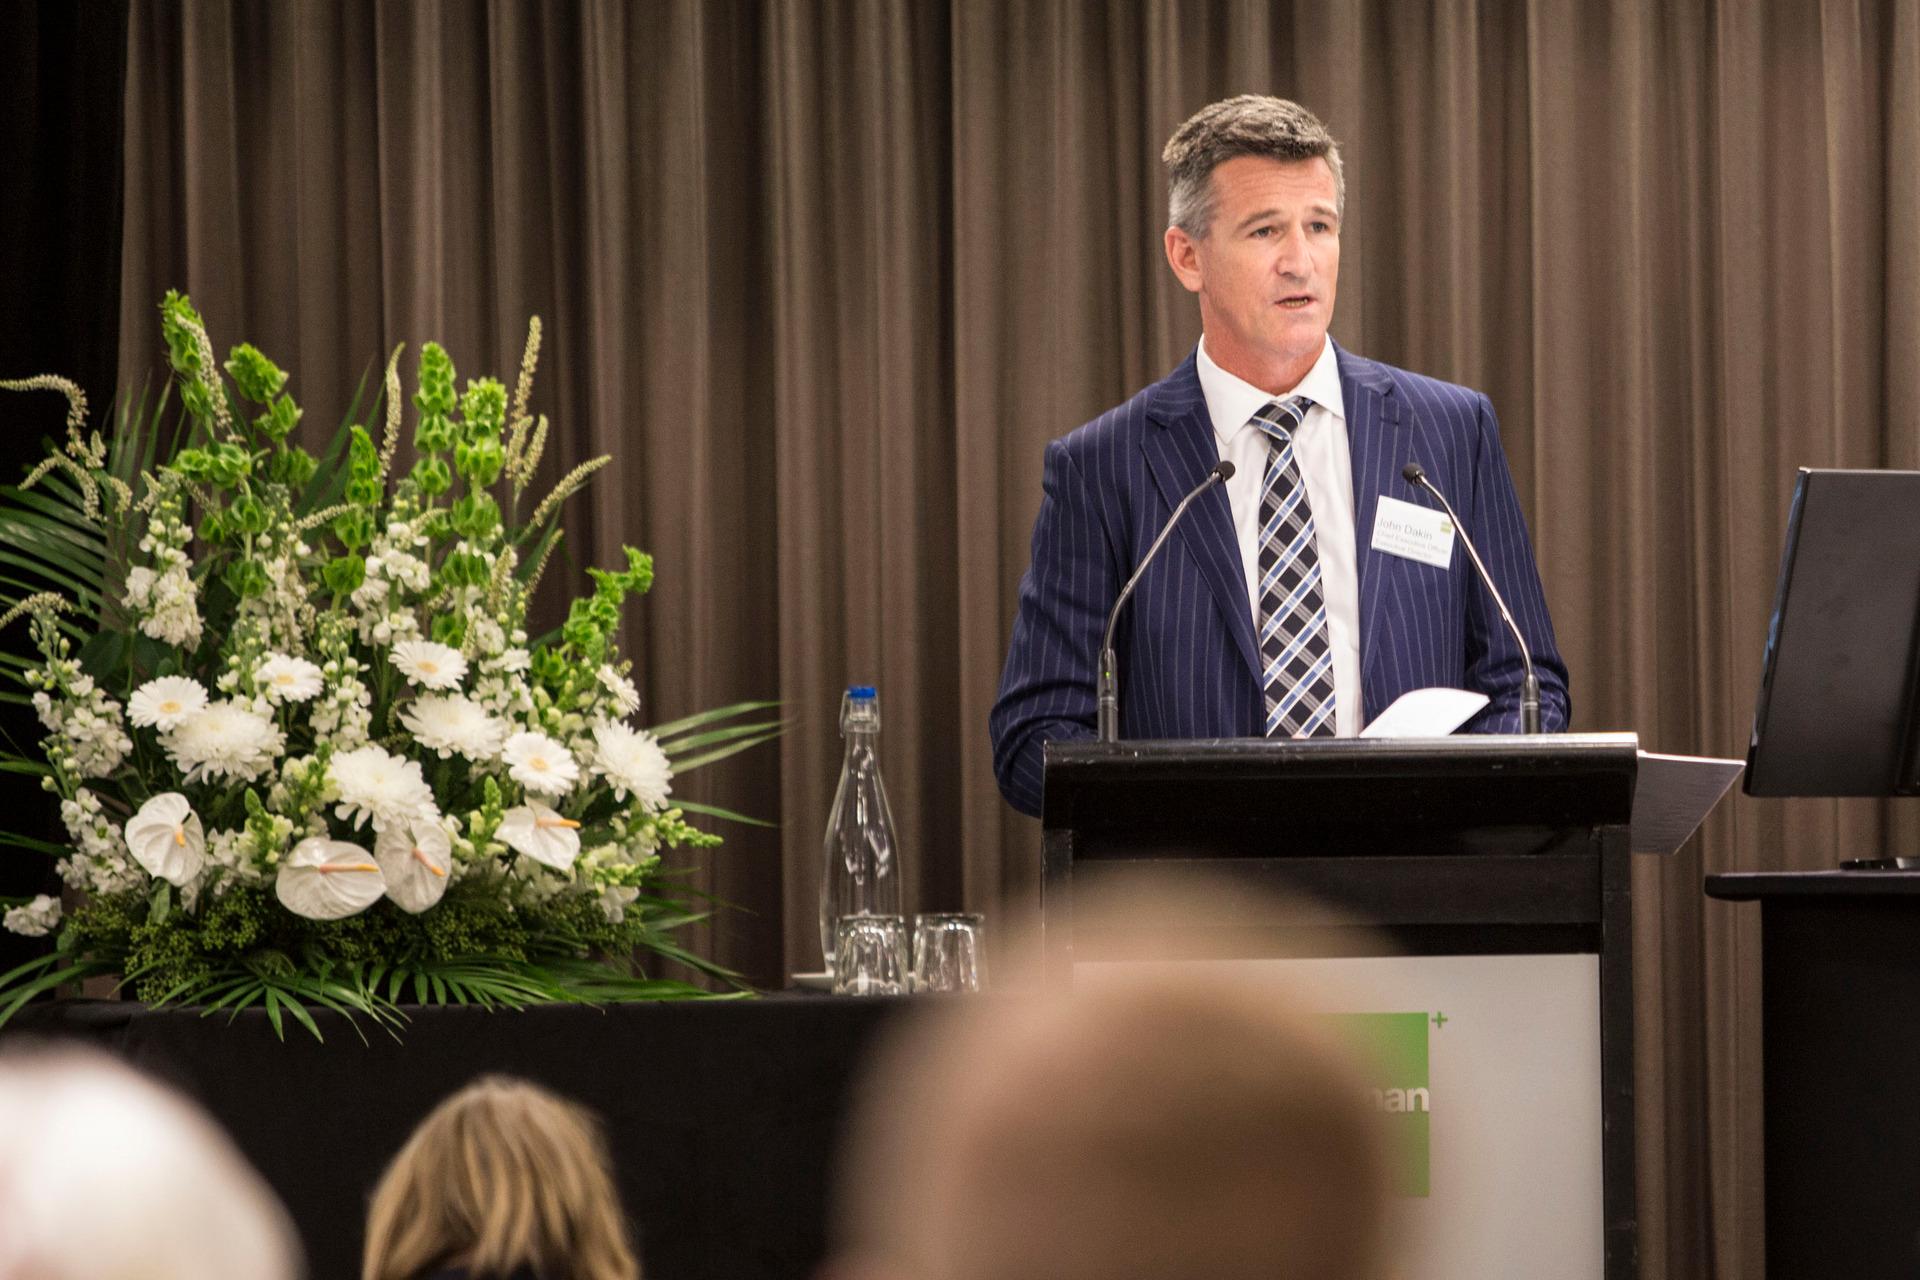 Goodman trust's 1H net profit quadruples on unrealised property gains